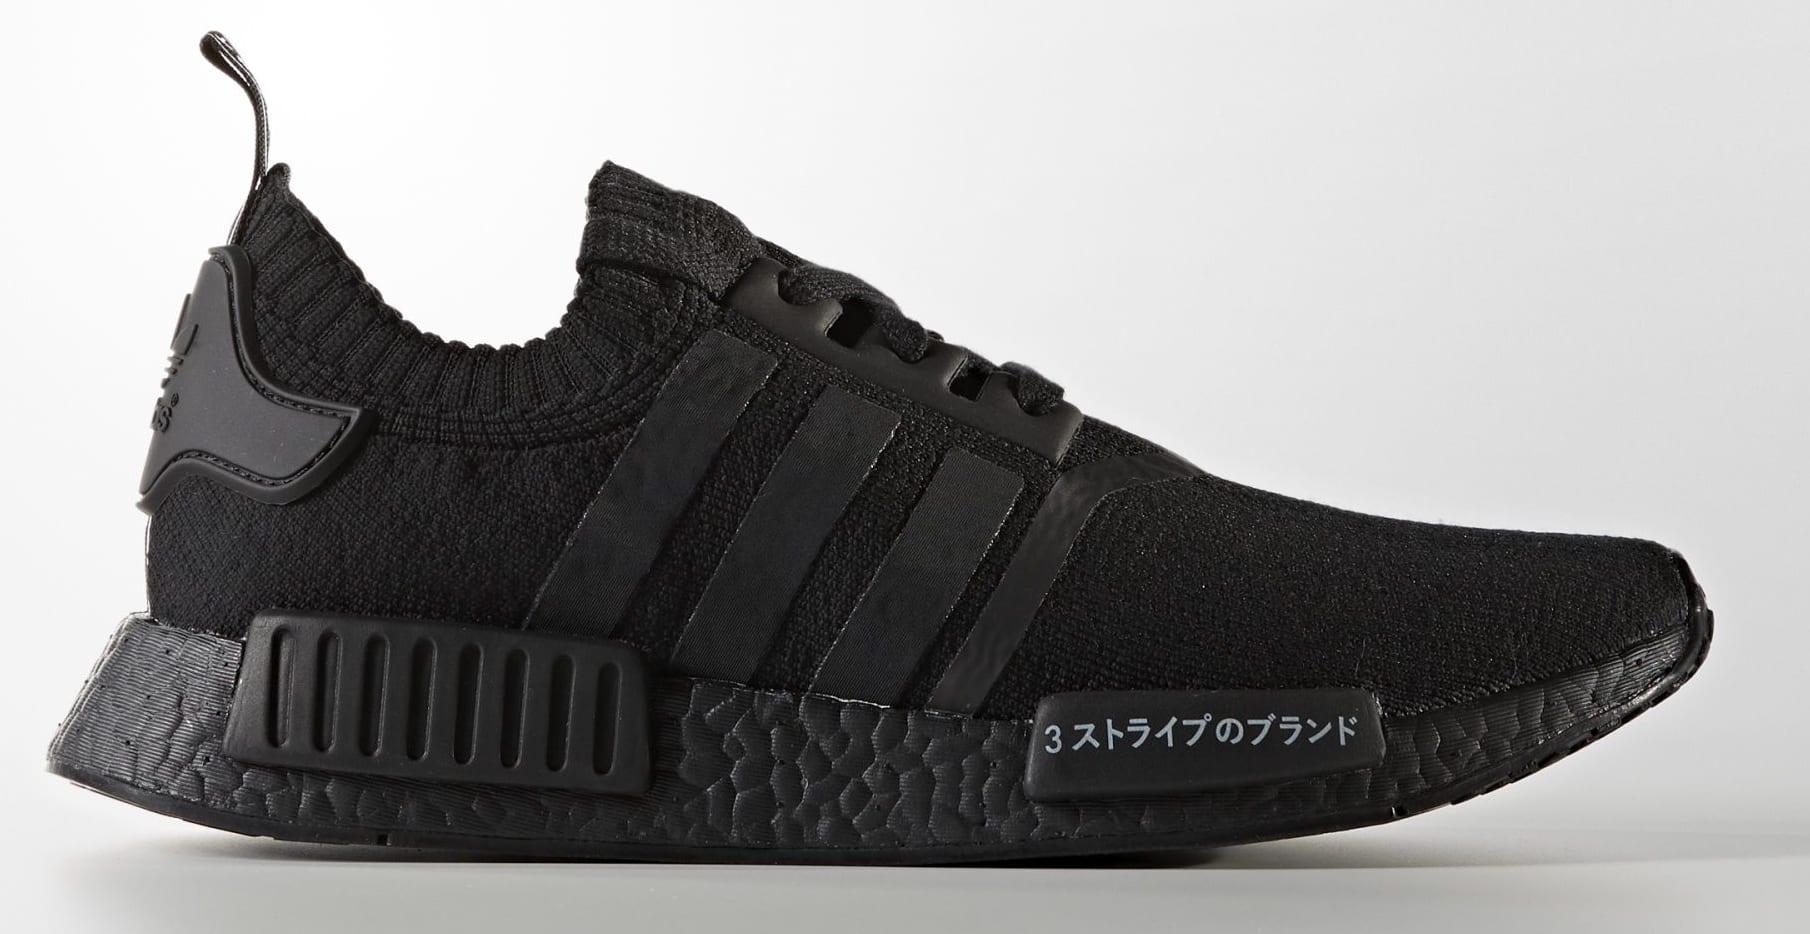 Adidas NMD R1 Triple Black Japan Boost PrimeKnit PK Mens Trainers BZ0220